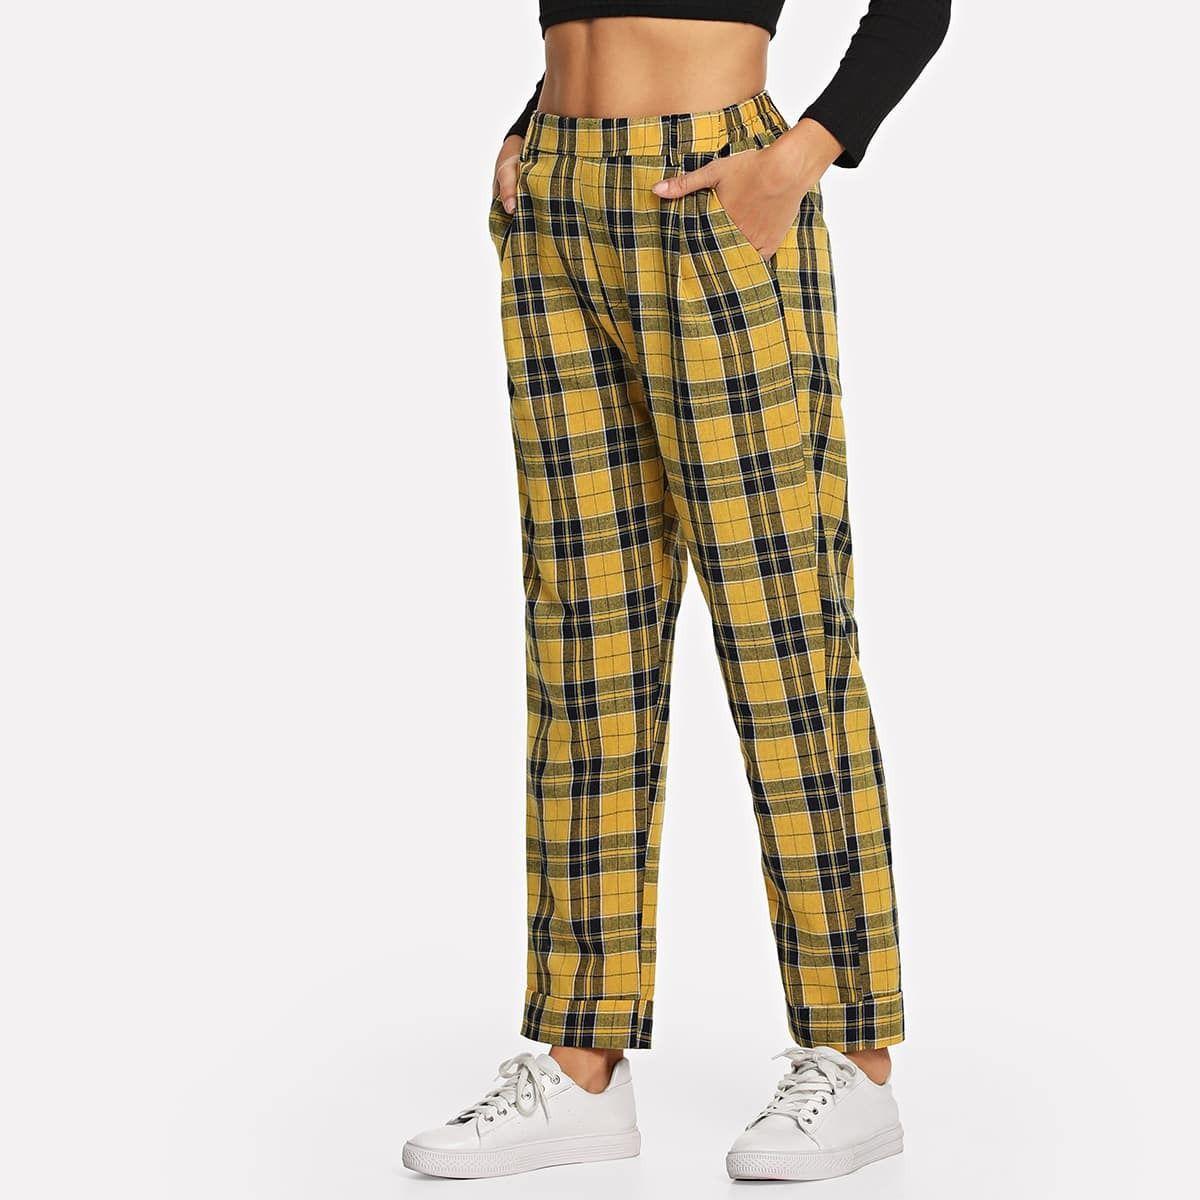 13 00 Pantalones De Cuadros Pantalones Ofertas Modamujer Shein Fashion Women Pants Casual Womens Dress Pants Plaid Pants